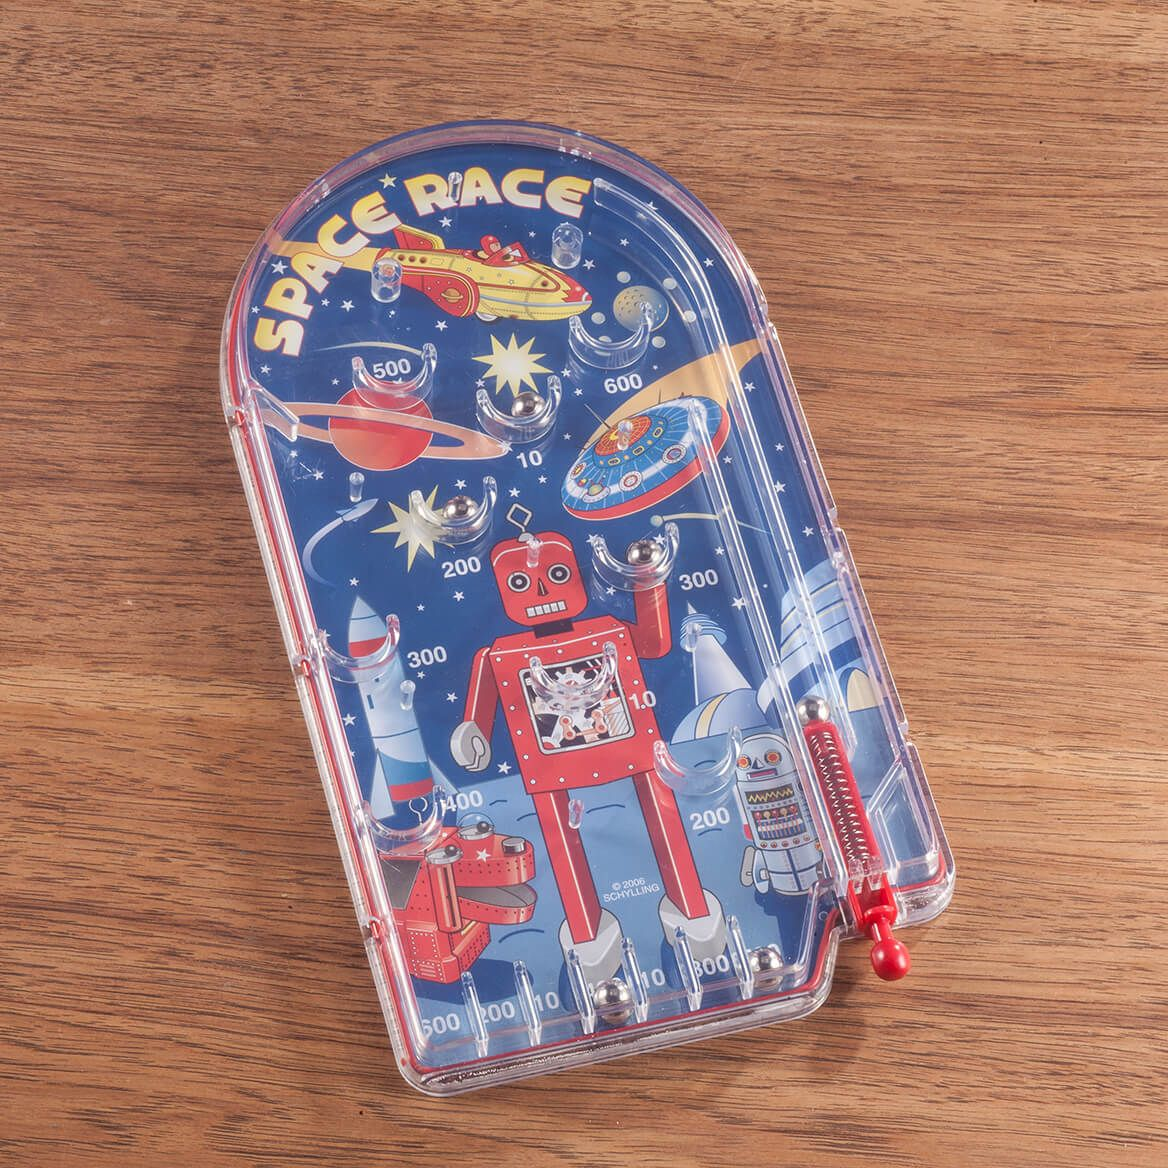 Space Race Pinball Game-364086